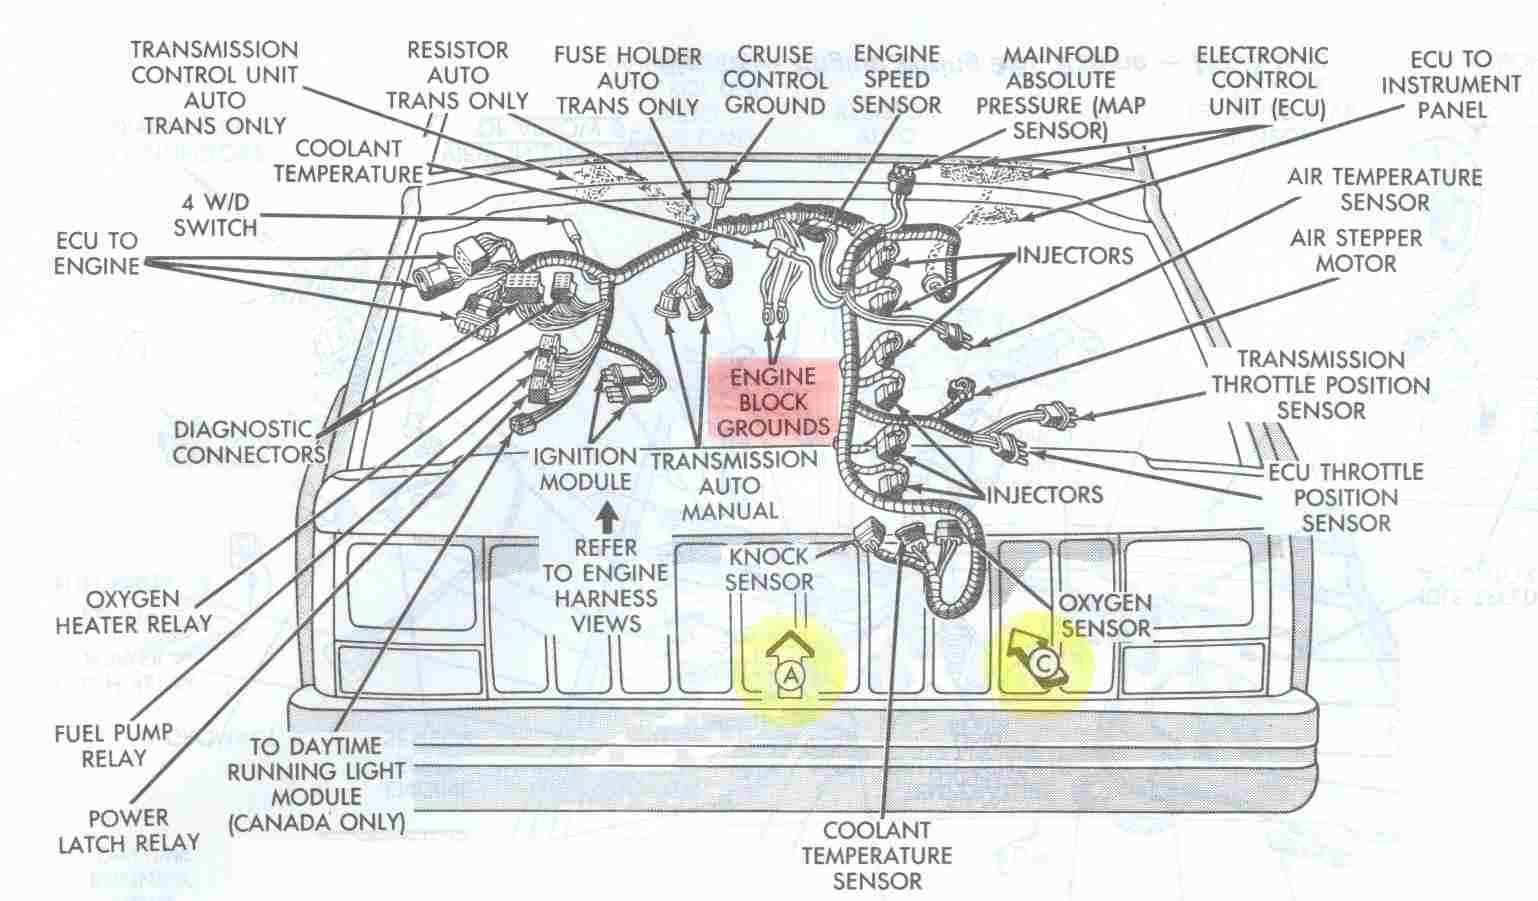 Peachy Jeep Cherokee Electrical Diagnosing Erratic Behavior Of Engine Wiring Cloud Rdonaheevemohammedshrineorg